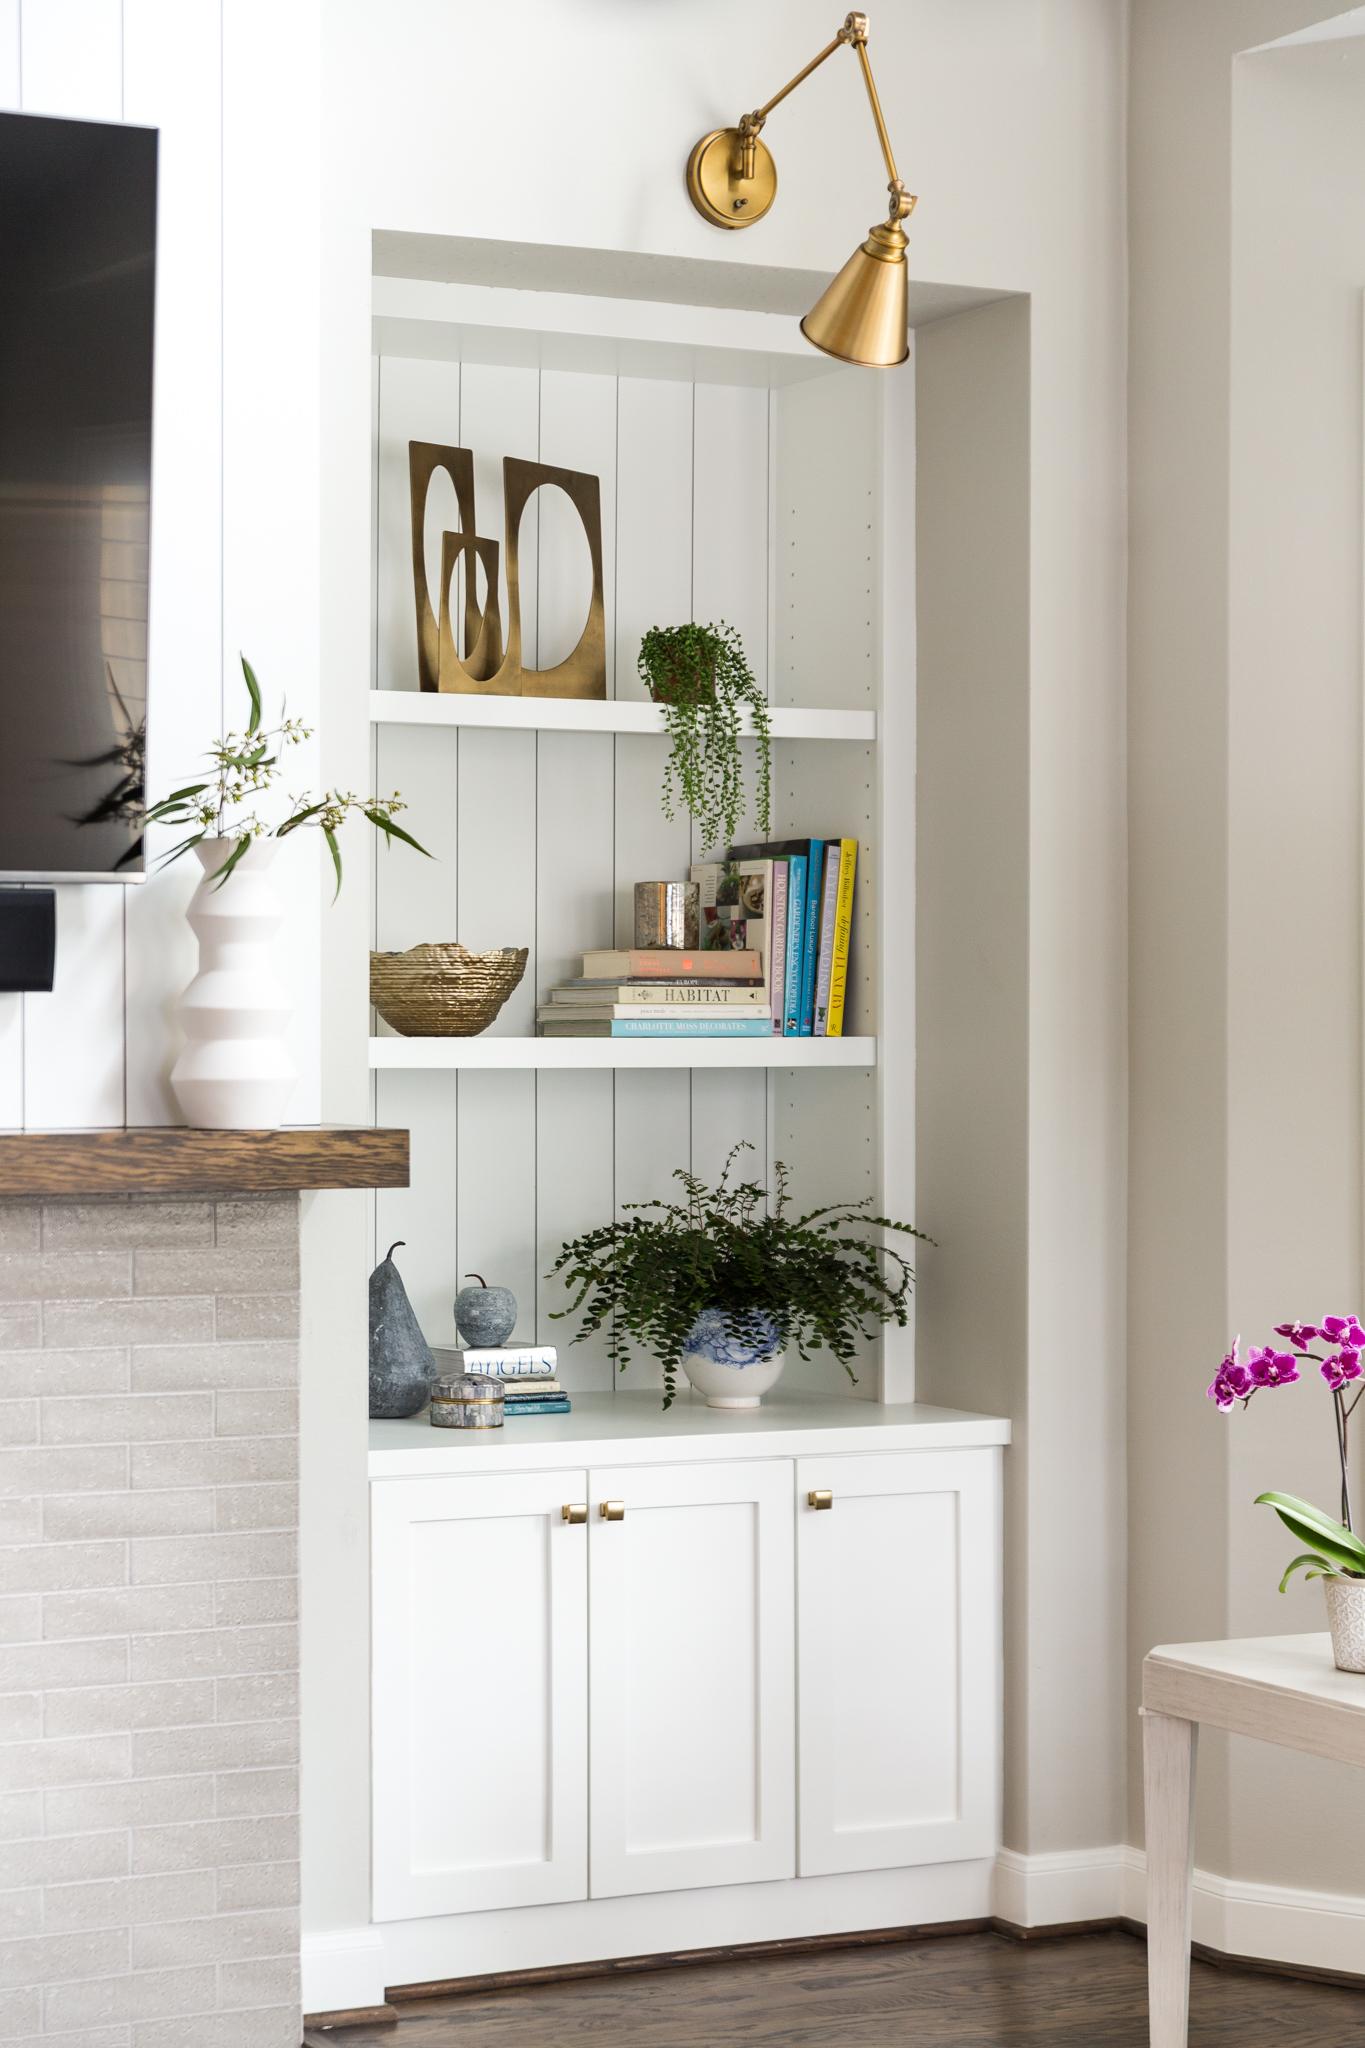 Bookshelf styling - Designer: Carla Aston, Photographer: Colleen Scott #bookshelfstyling #books